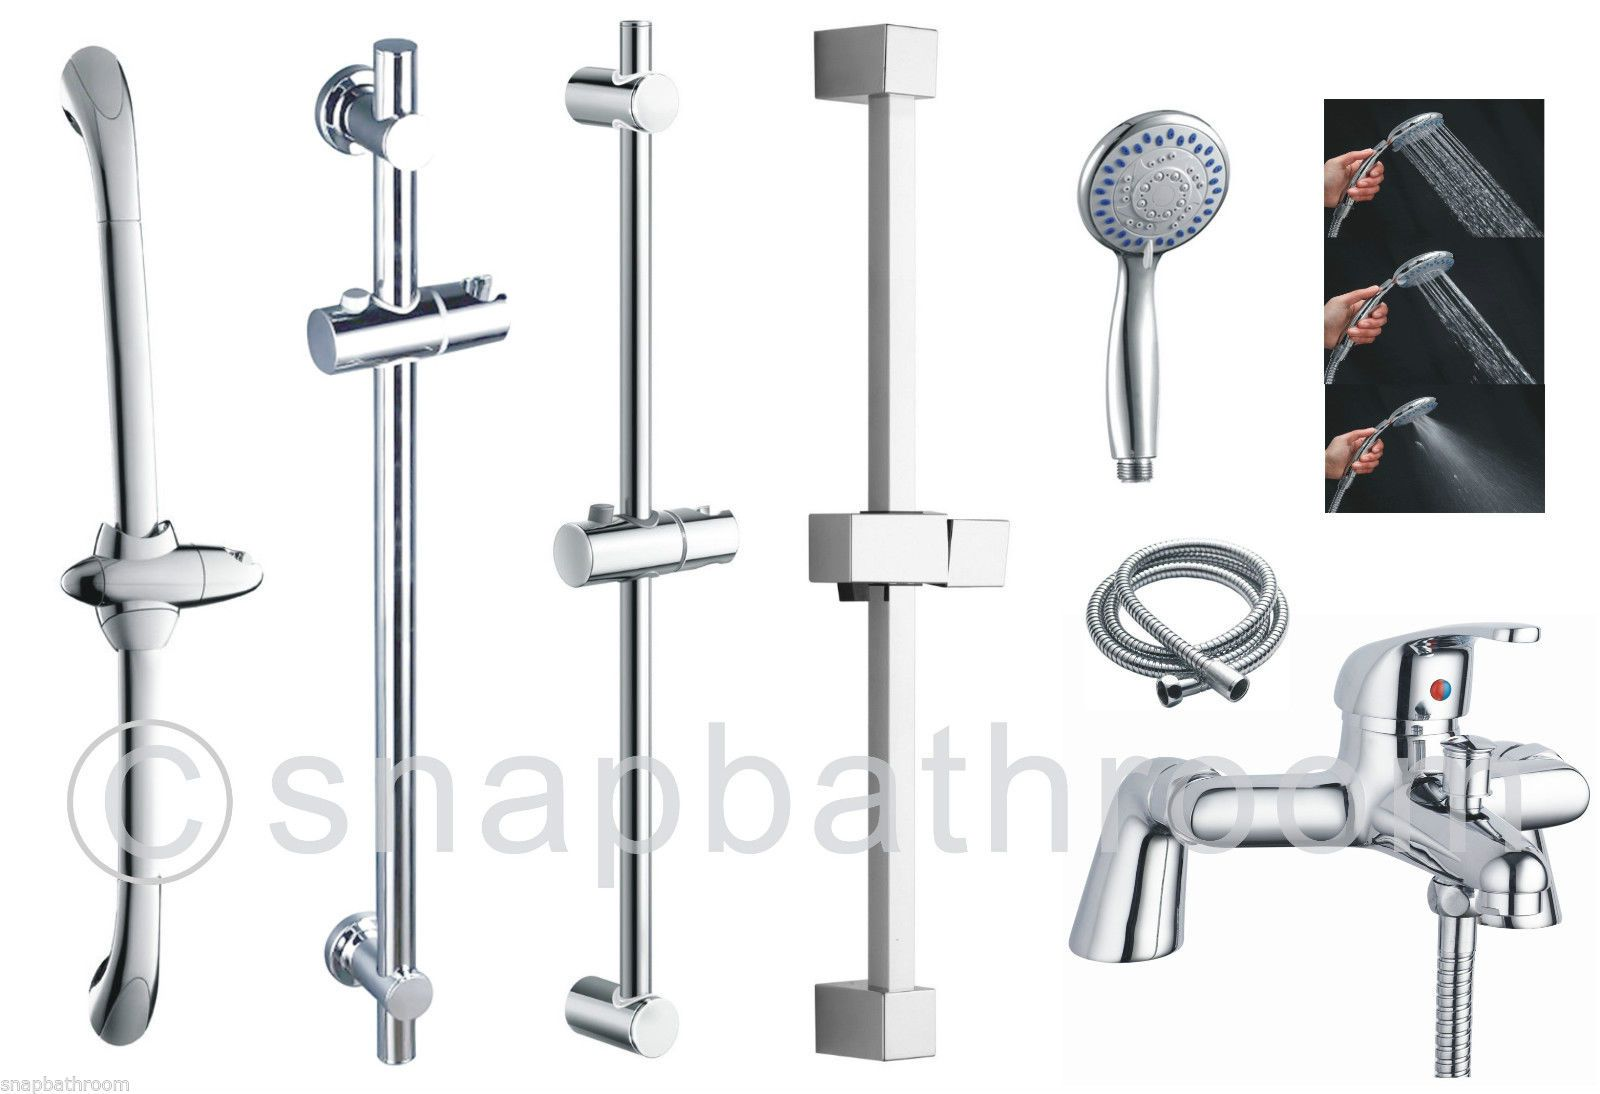 Adjustable Chrome Bathroom Shower Riser Rail Bar Bracket Shower